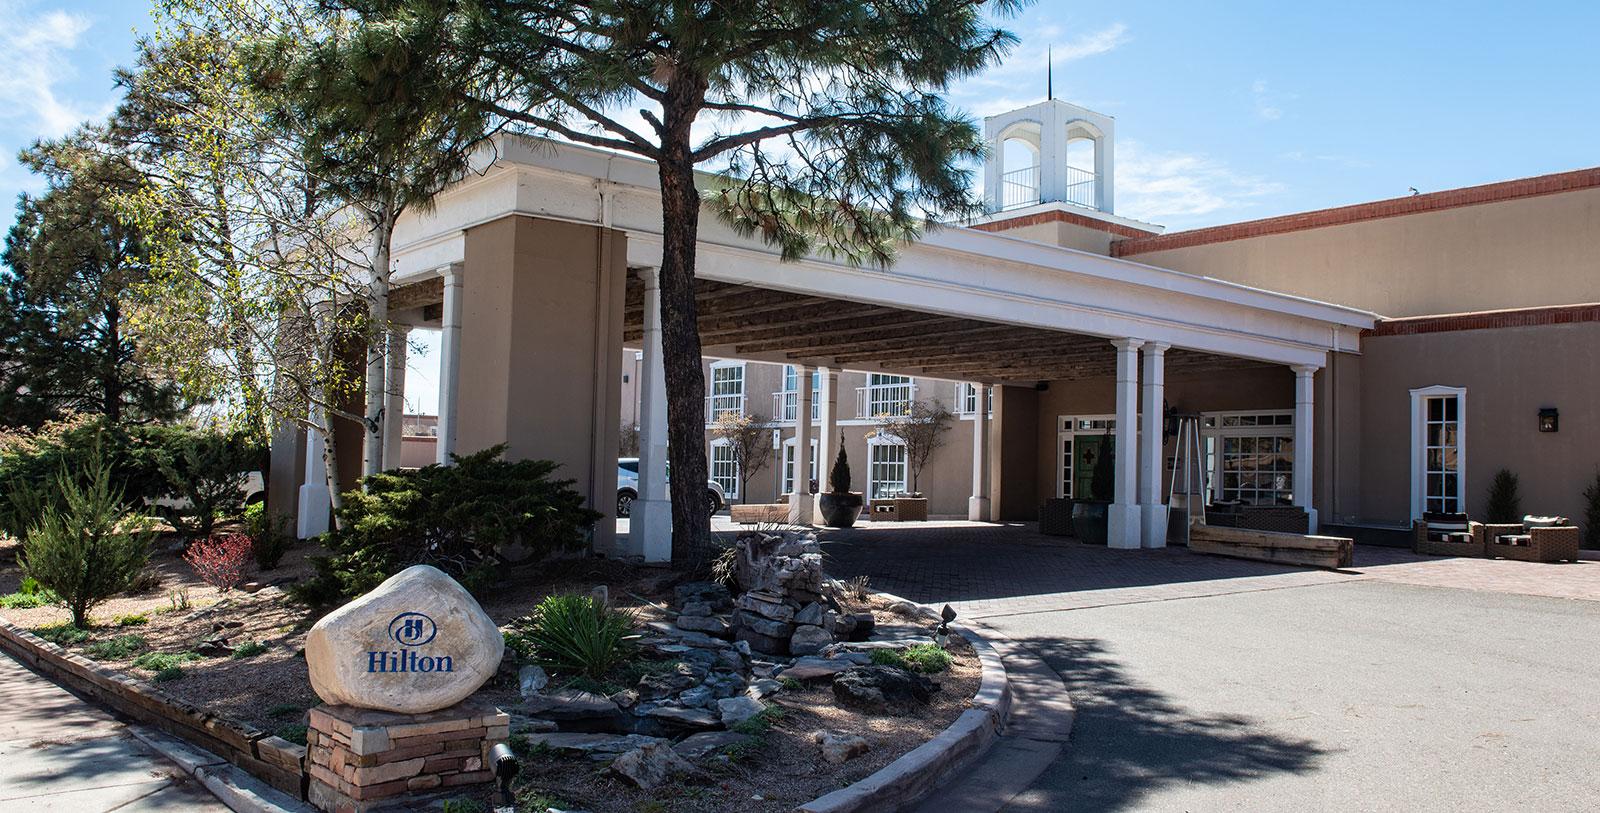 Image of Hotel Exterior, Hilton Santa Fe Historic Plaza in Santa Fe, New Mexico, 1625, Member of Historic Hotels of America, Overview